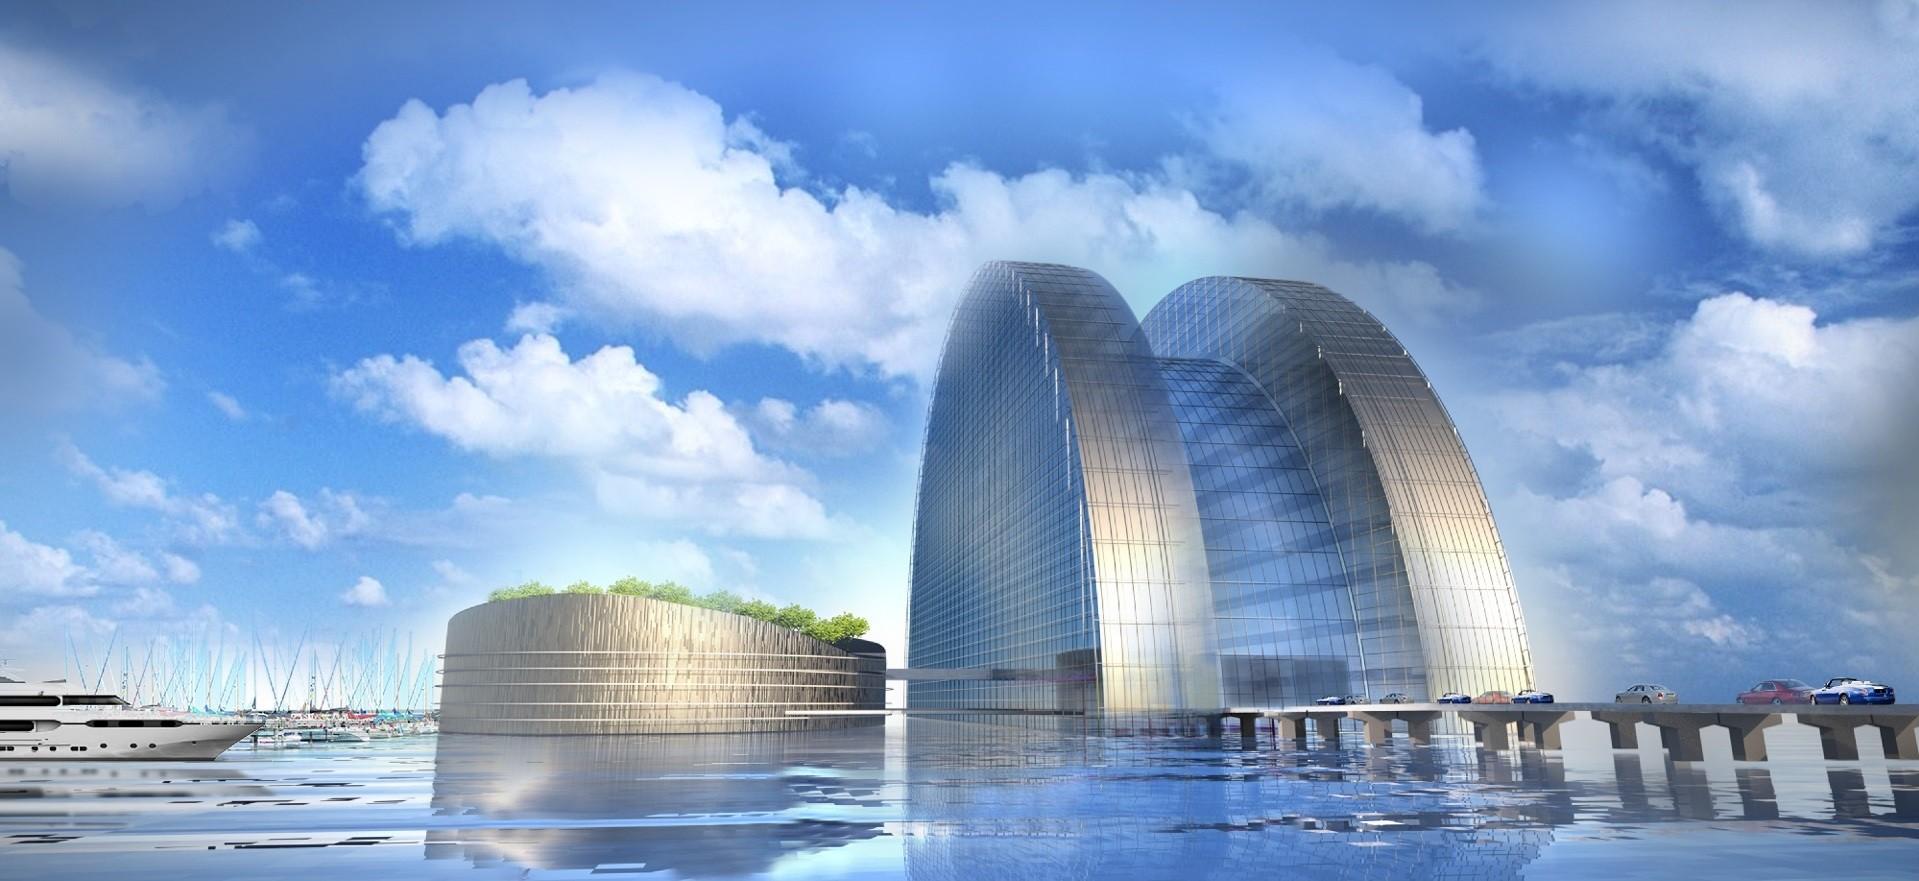 M Castedo Architects Unveils 30-Story Silver Pearl Hotel For Qatar 2022 World Cup, © M Castedo Architects